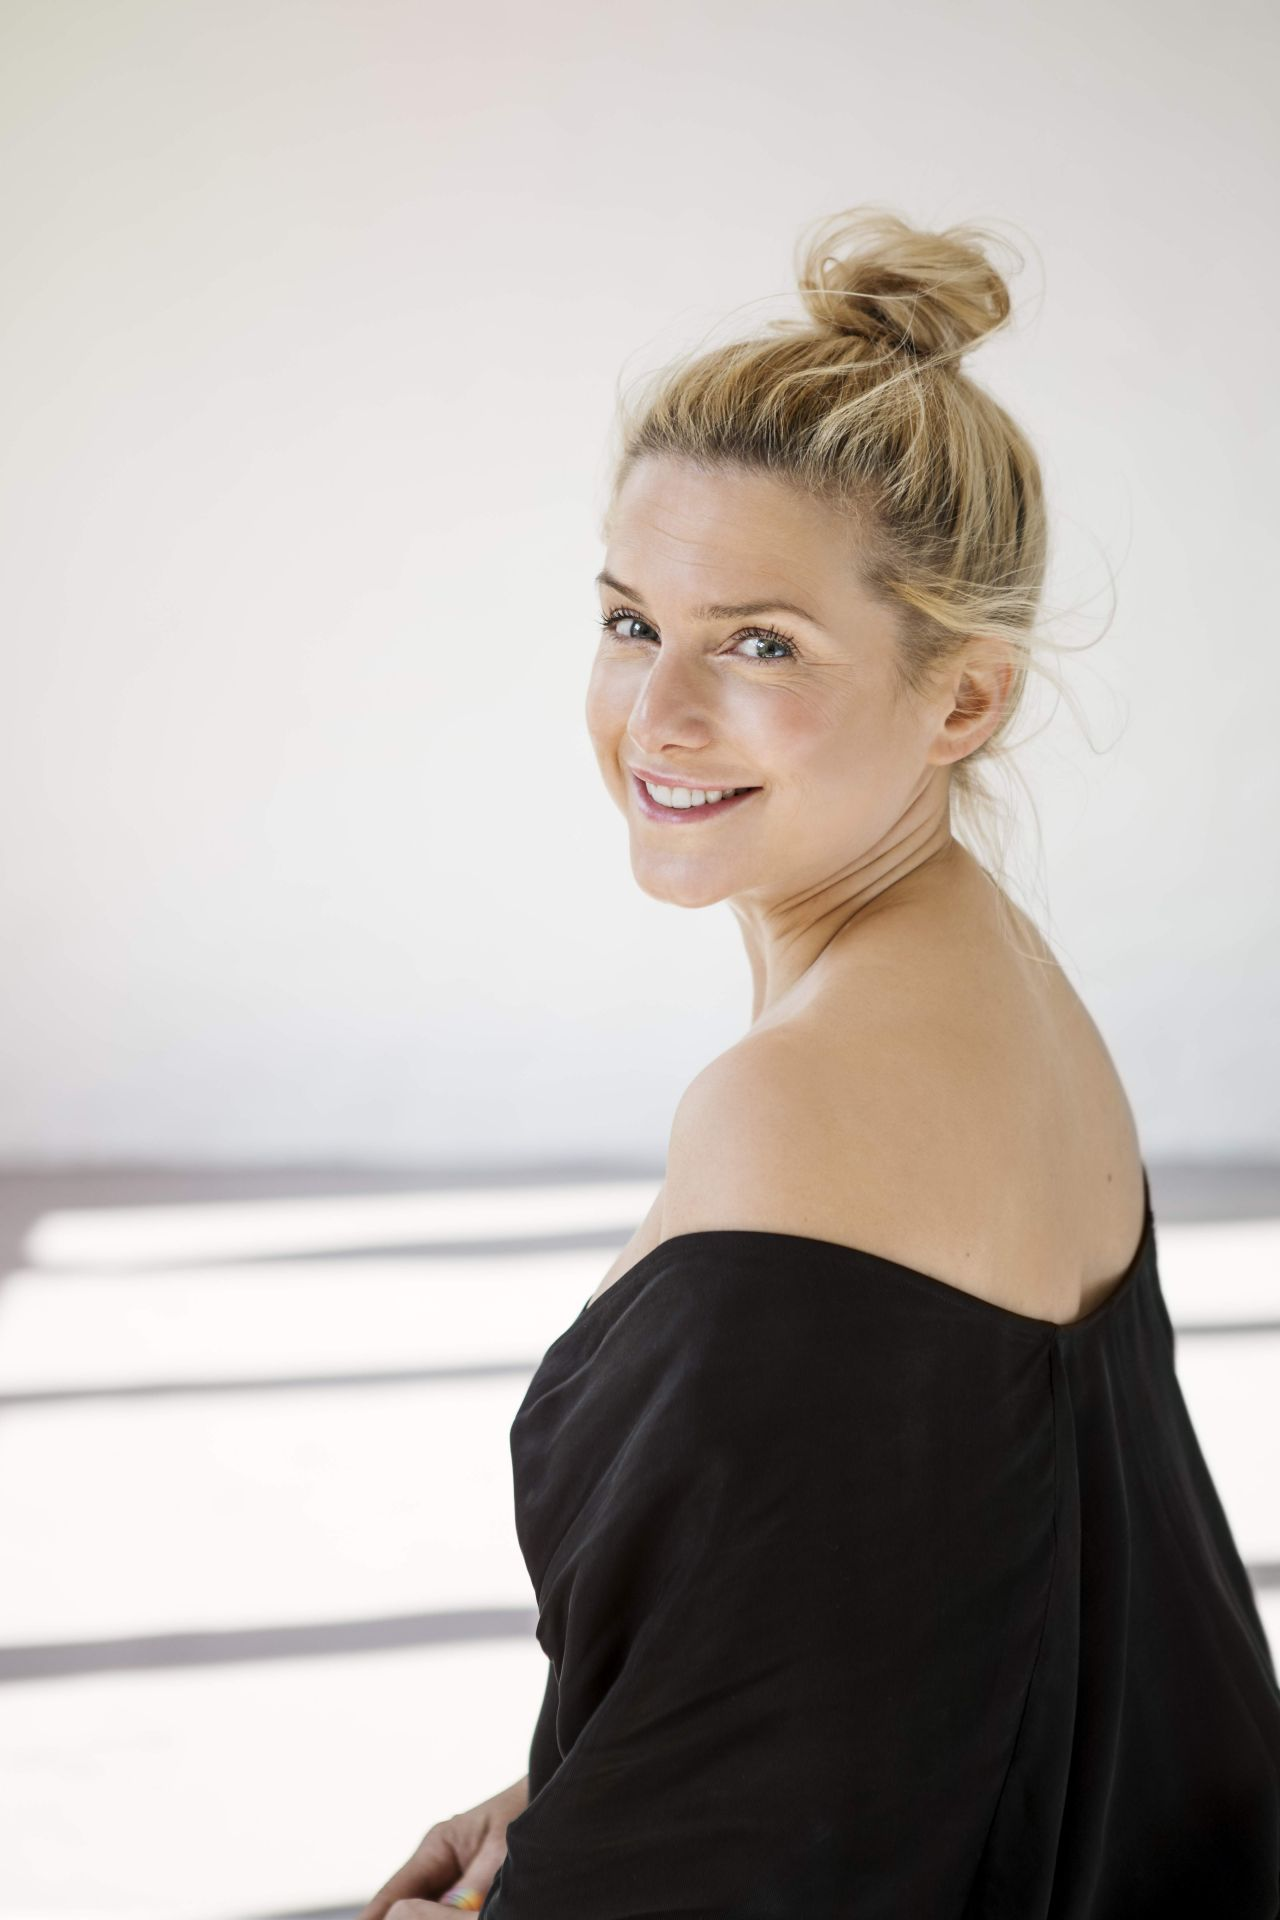 Janet biedermann 2019